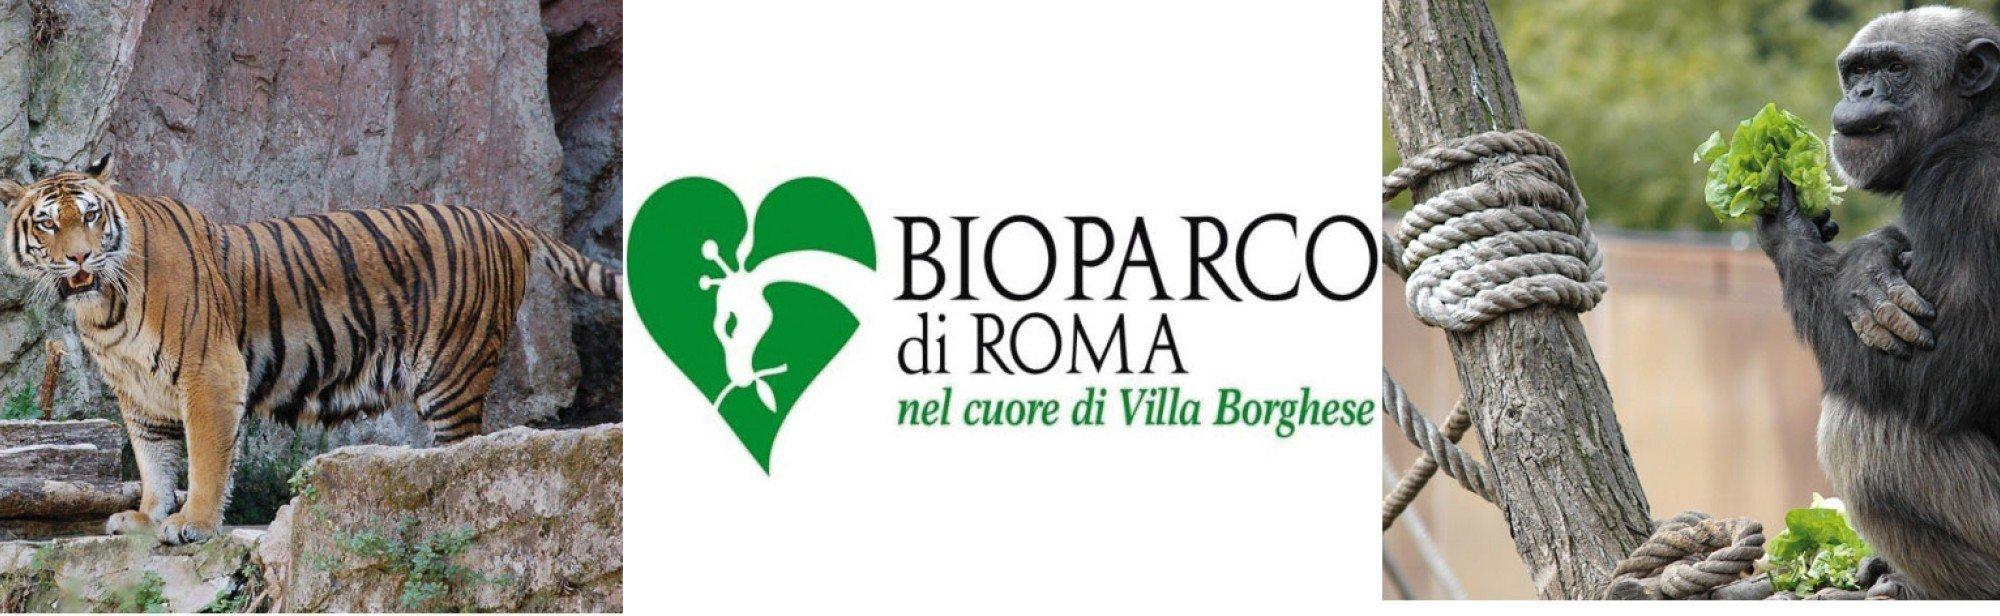 The Biopark in Rome